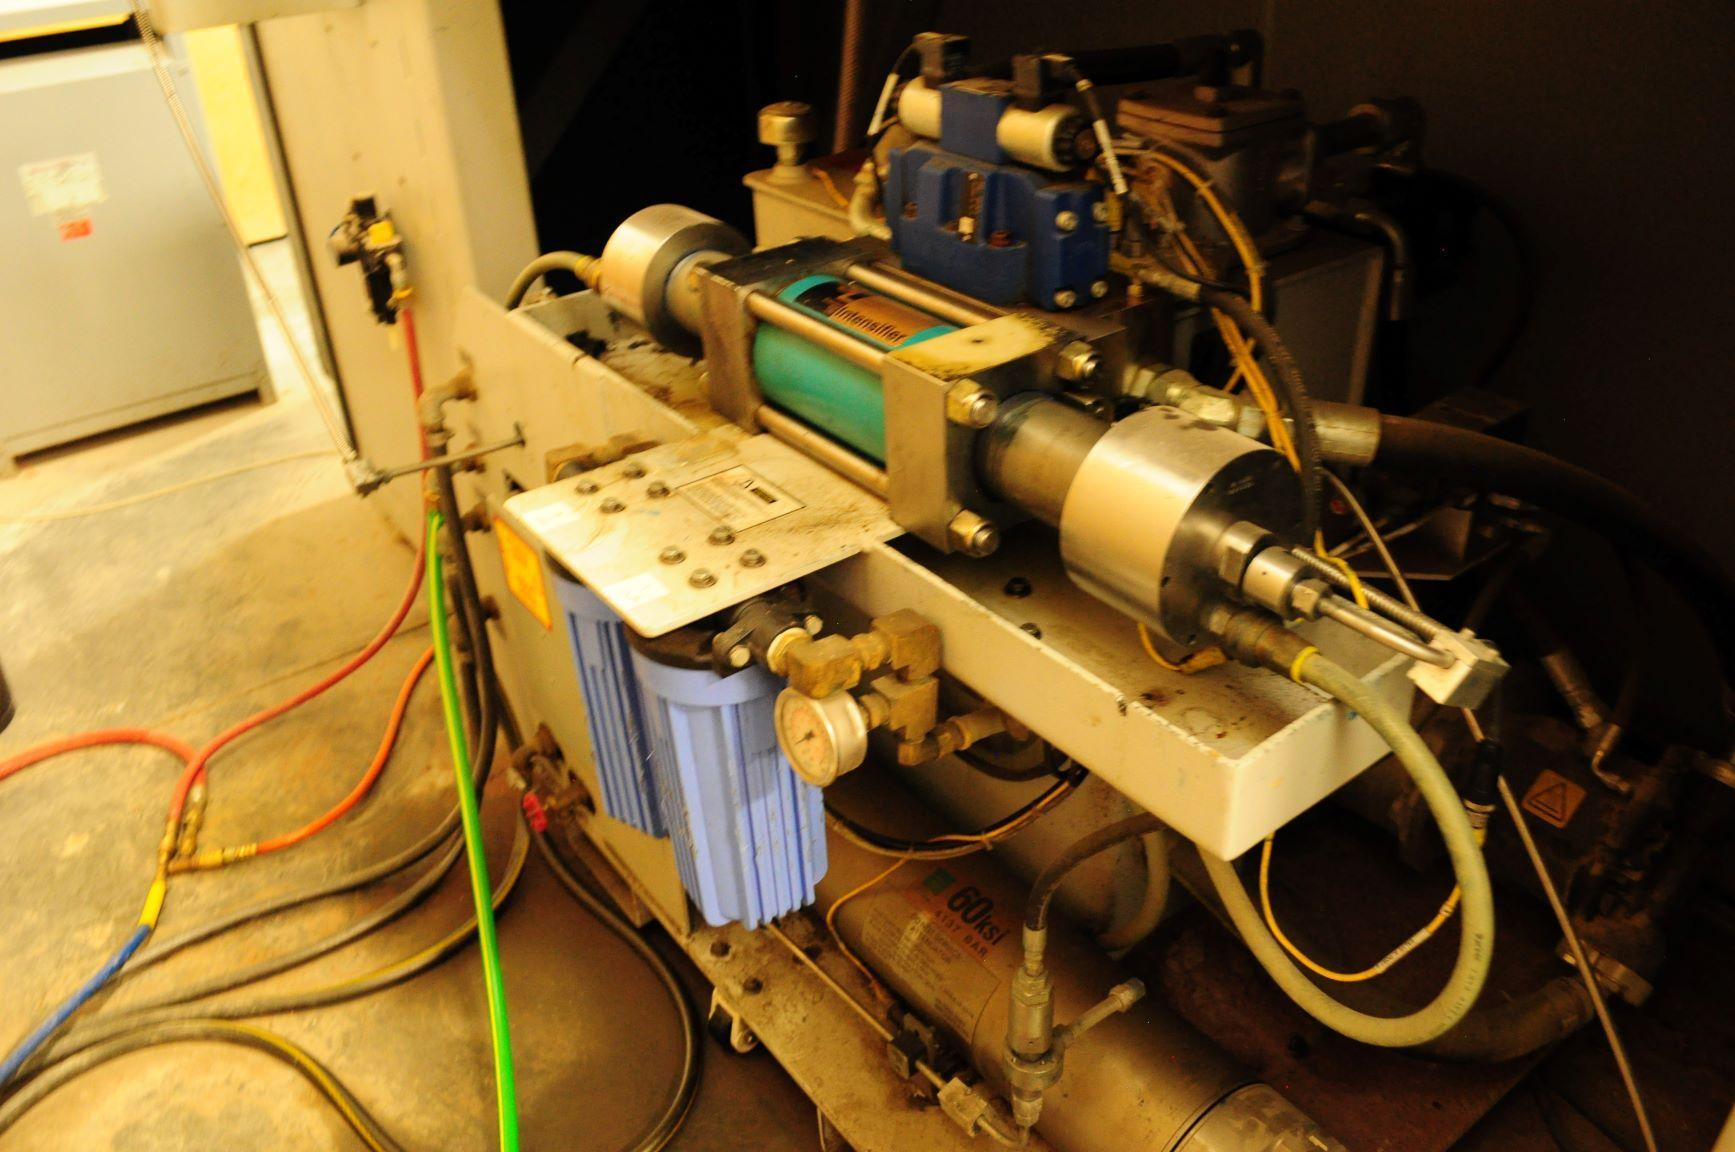 FLOWFlow Mach 3 1313b Dynamic CNC Waterjet Cutting System - 2011